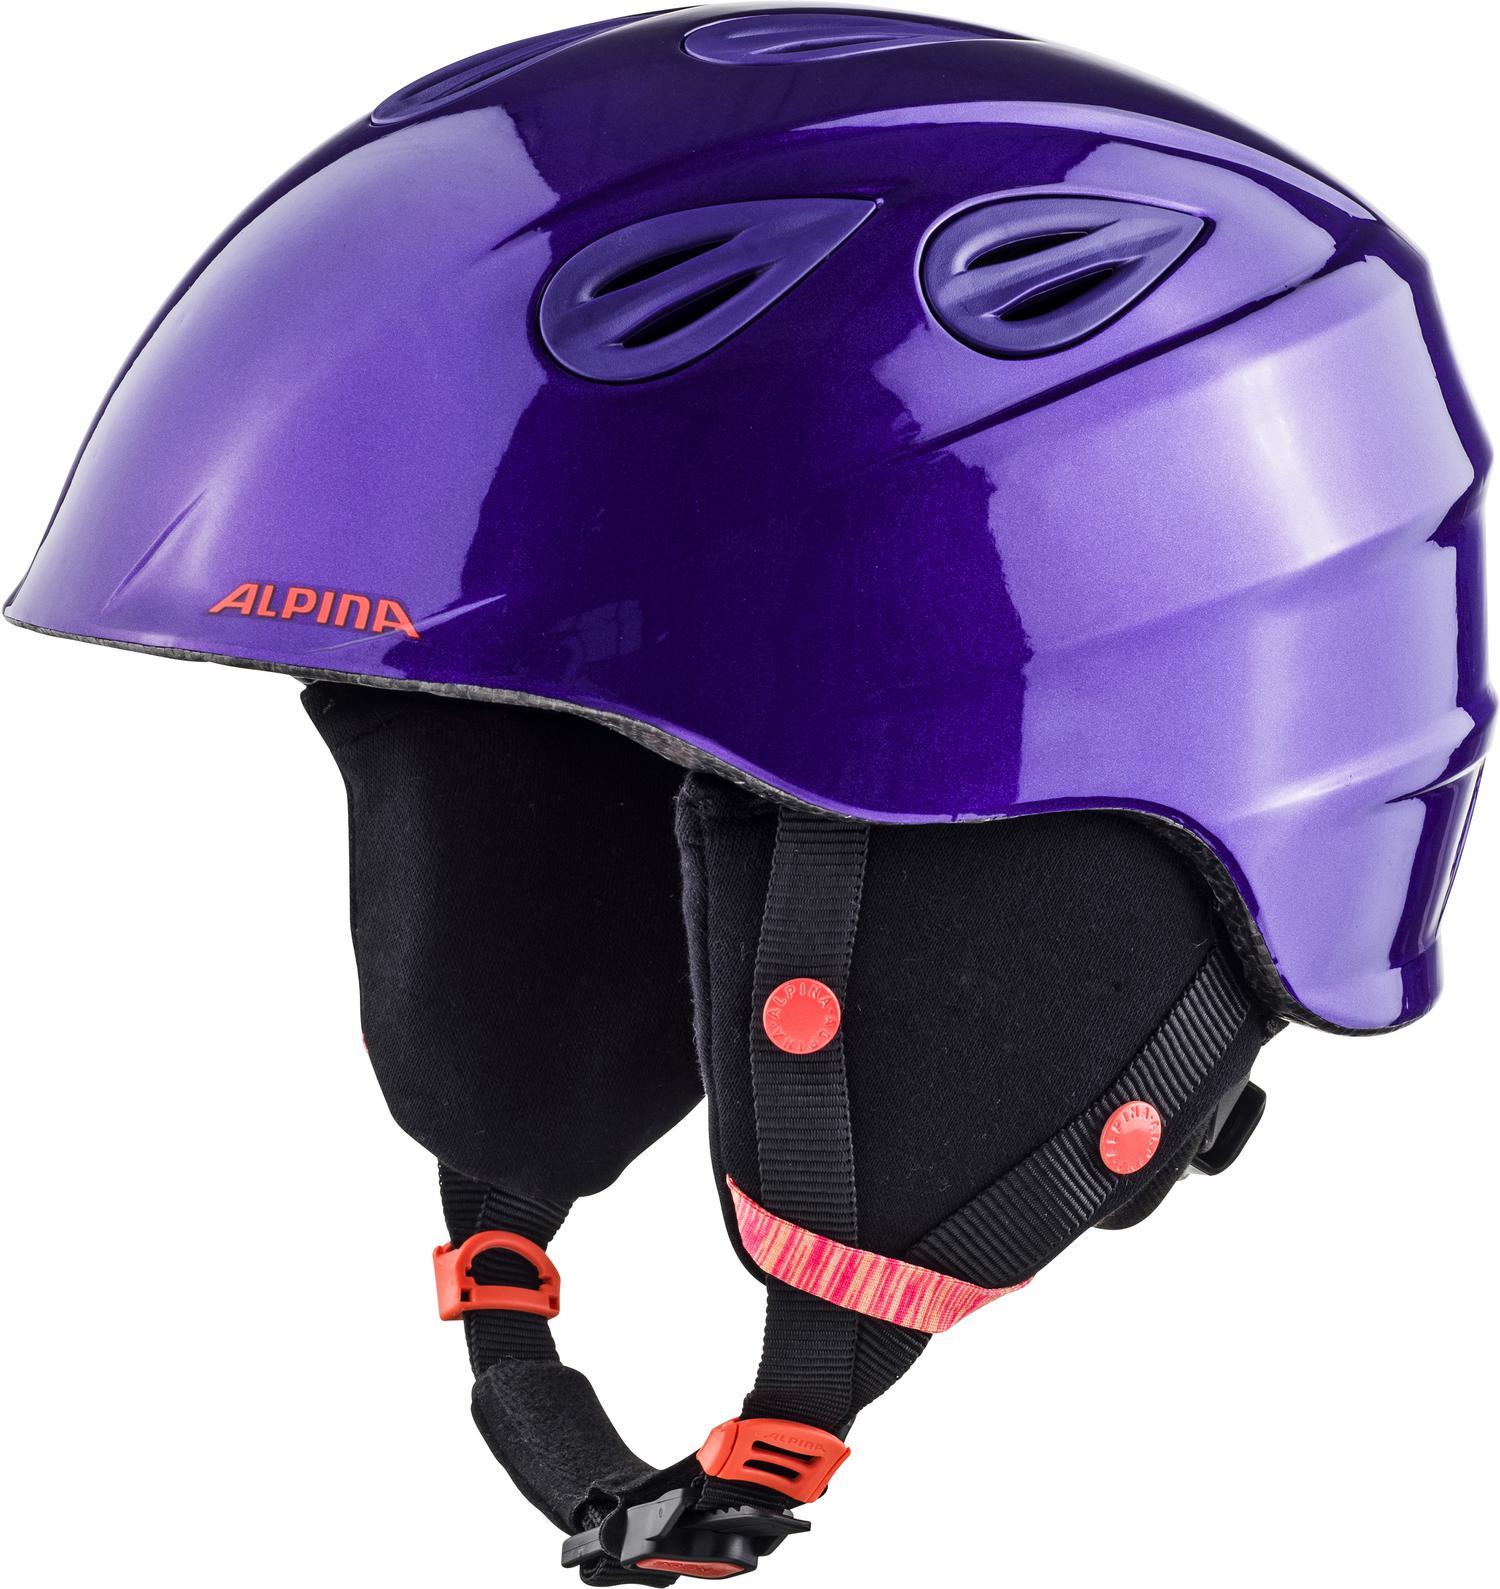 ALPINA GRAP 2.0 JR ROYAL PURPLE kask narciarski R. 51 54